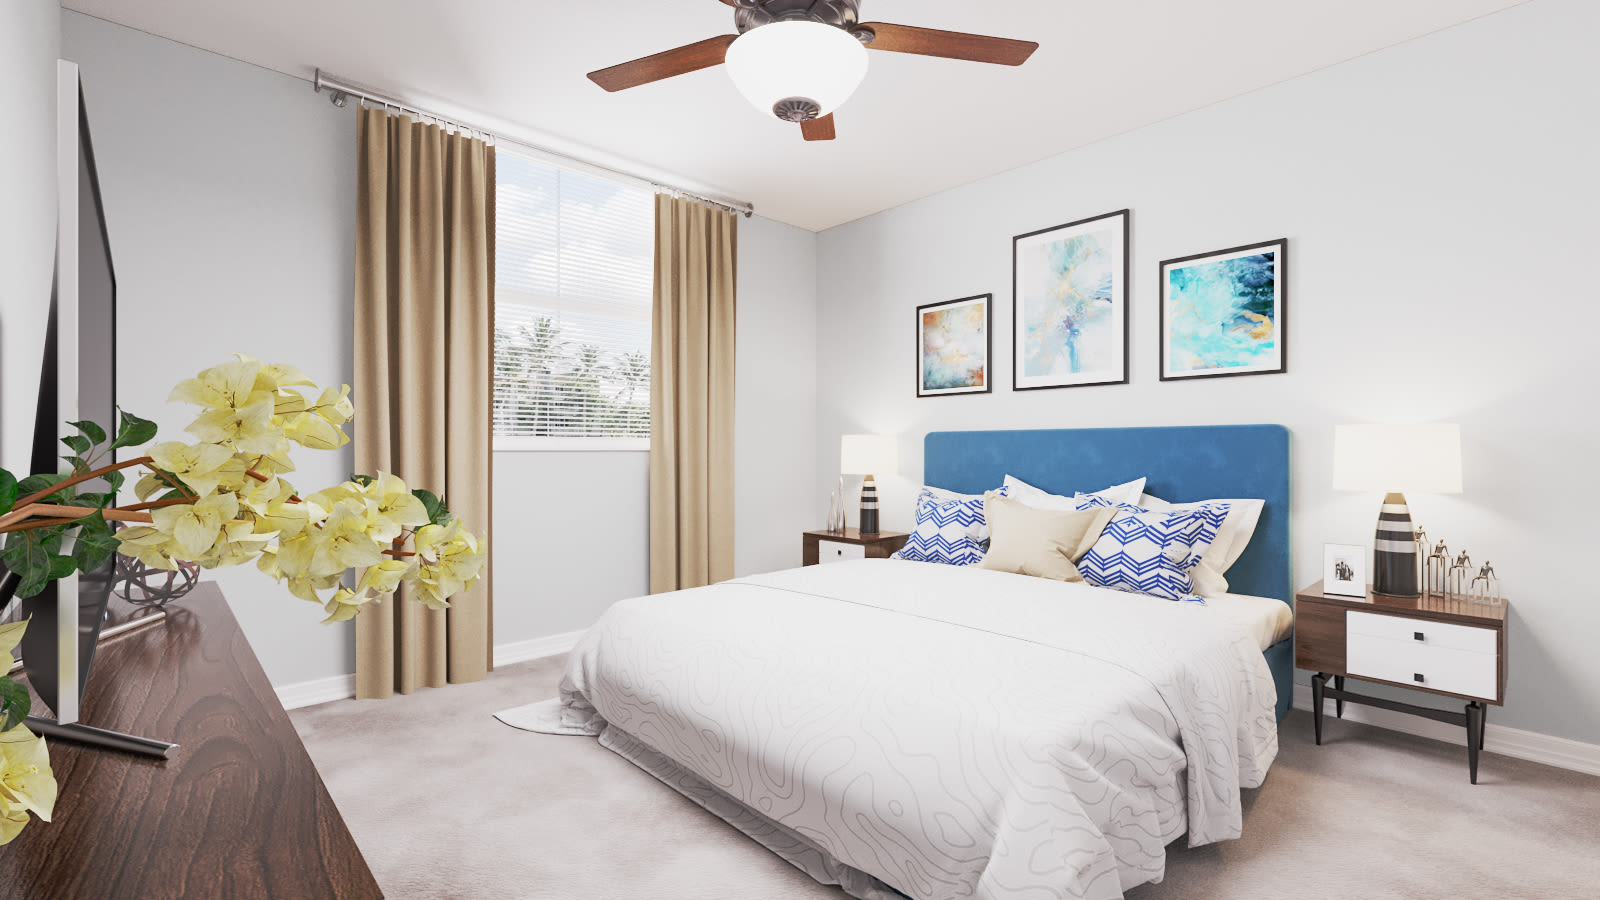 View virtual tour for 2 bedroom 2 bathroom unit at Beach Walk at Sheridan in Dania Beach, Florida